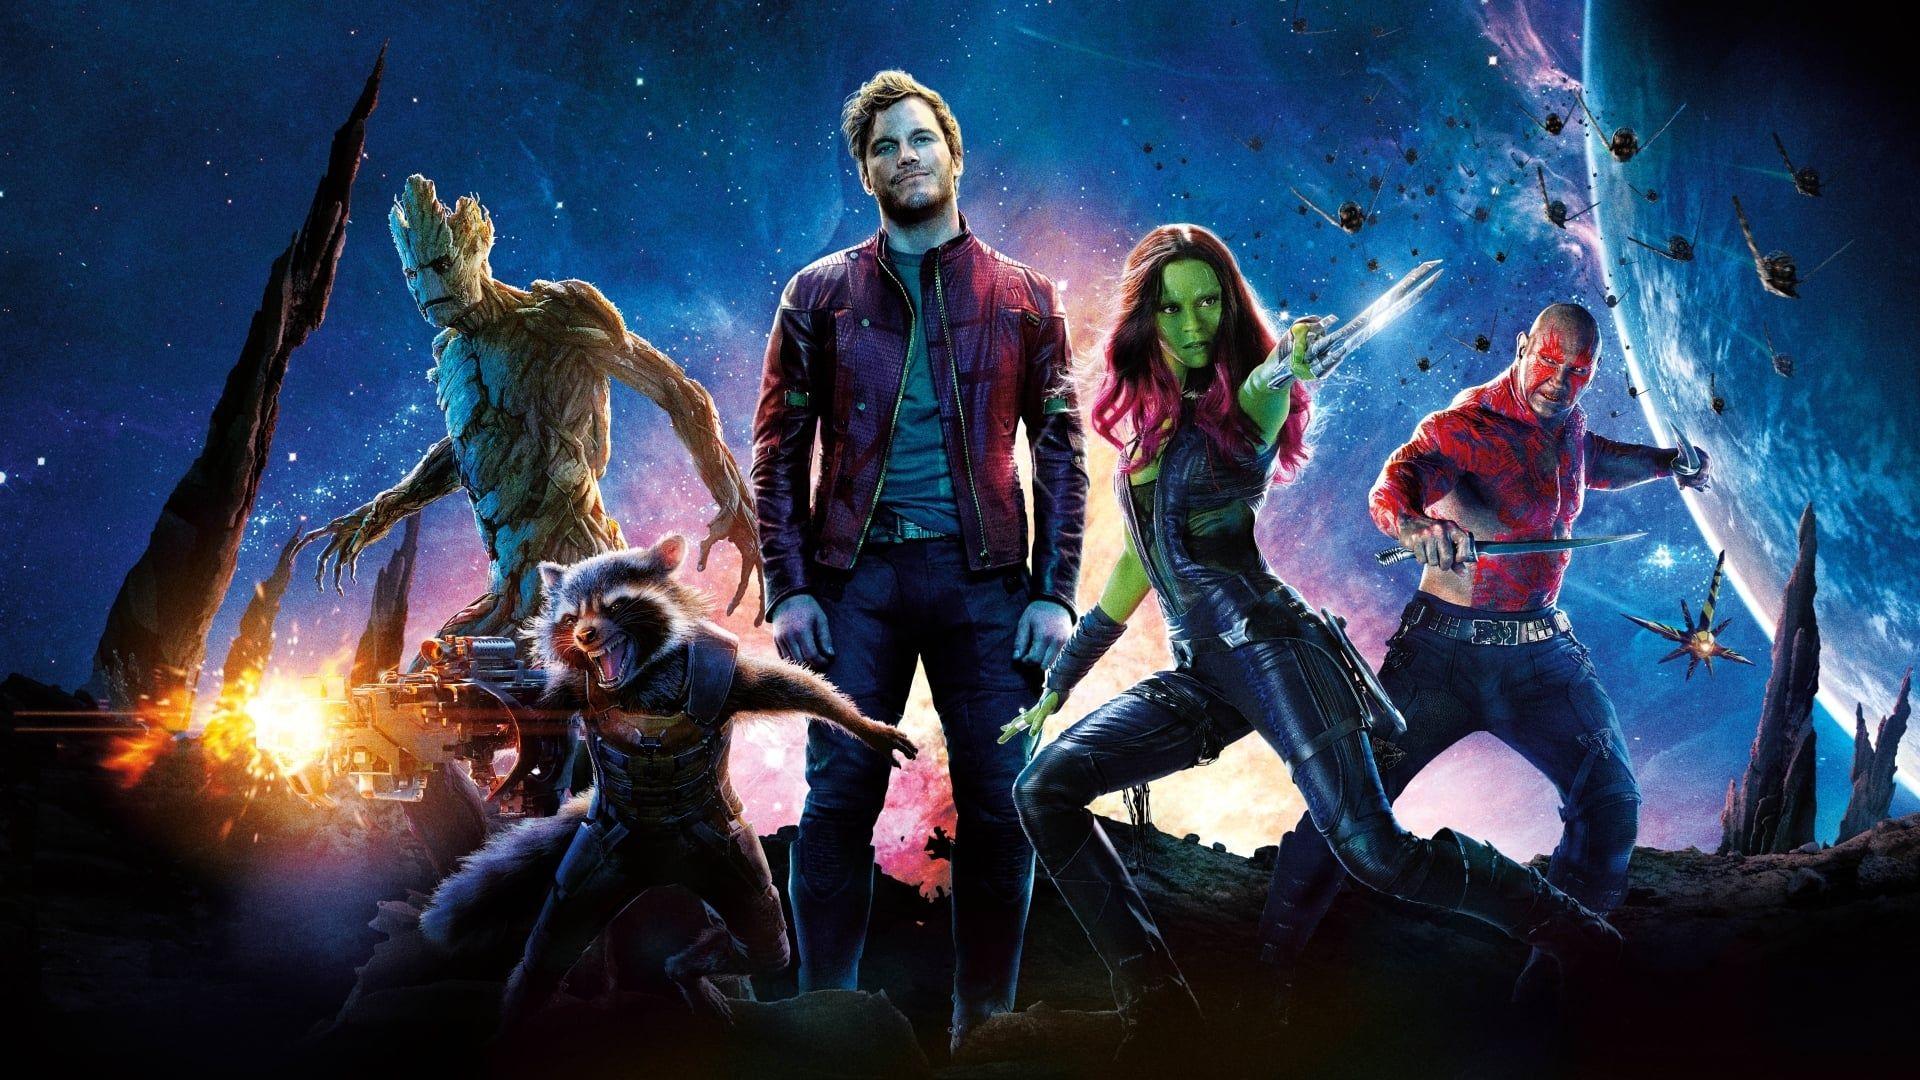 Watch Guardians Of The Galaxy 2014 Full Movie Online Free Light Years From Earth 26 Years After B Guardianes De La Galaxia Peliculas En Castellano Galaxia